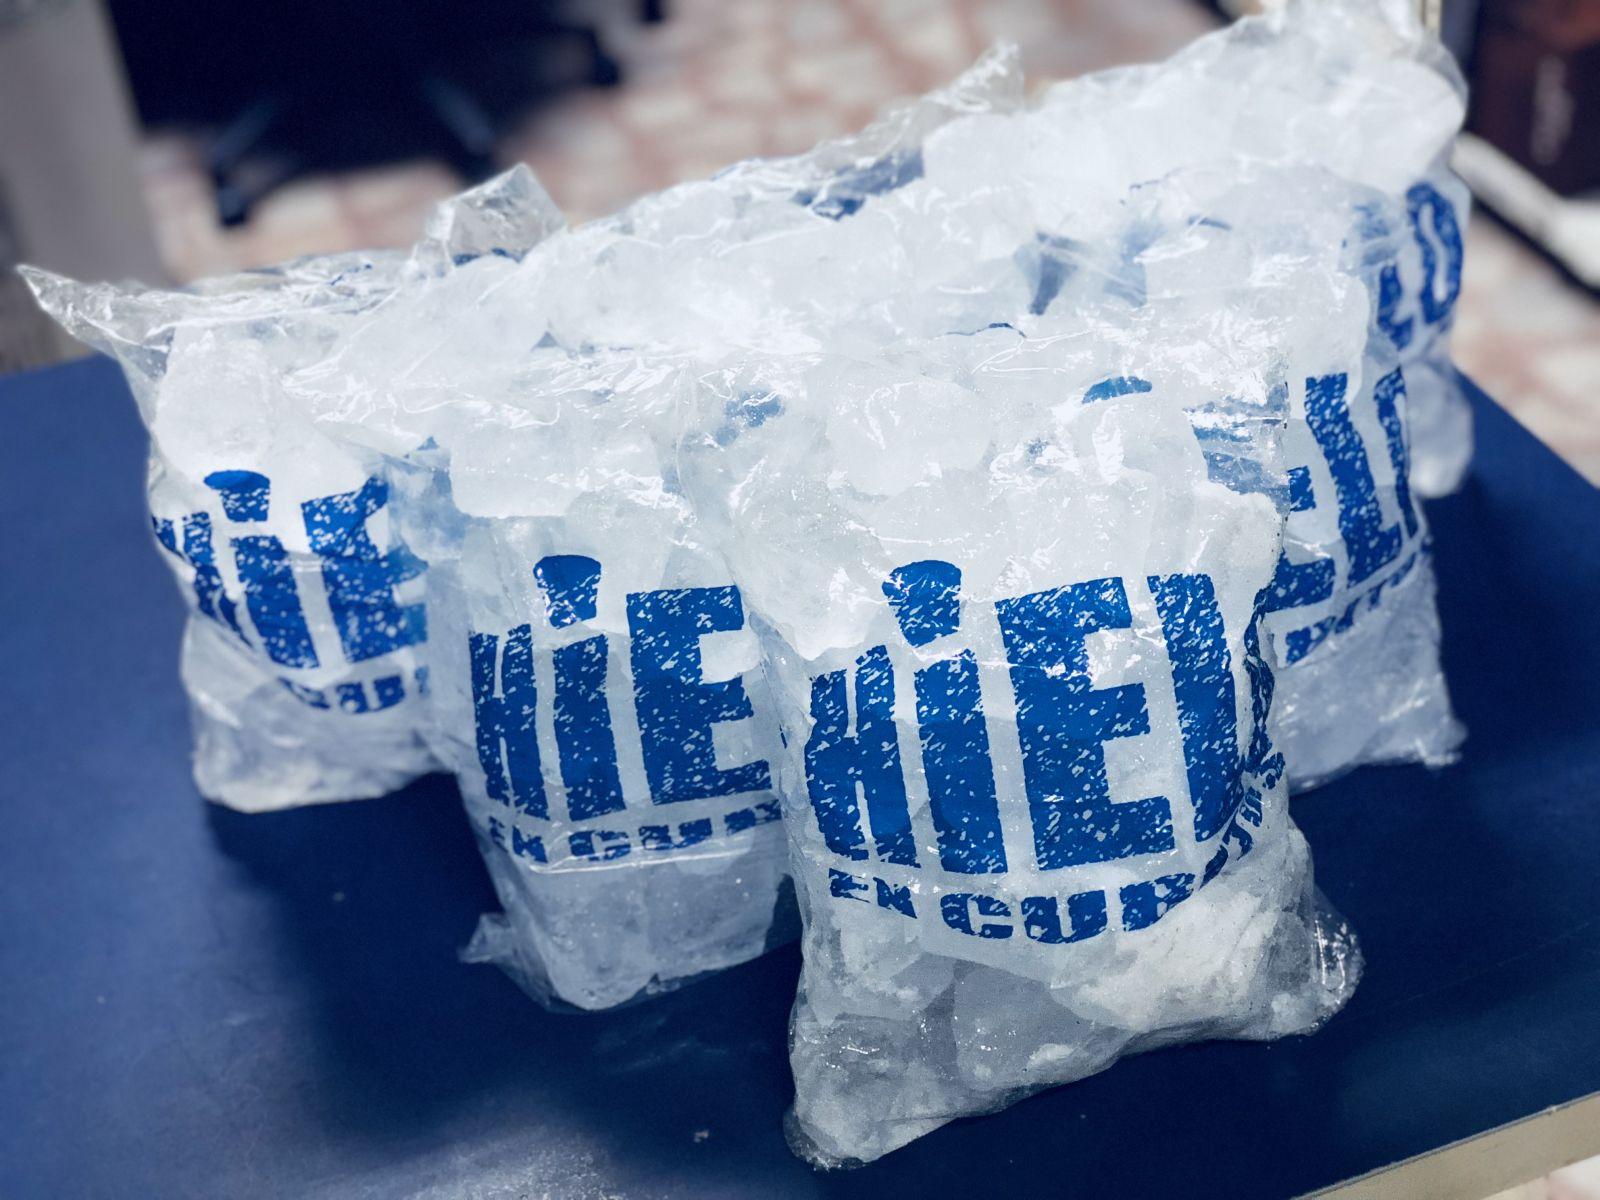 hielo en cubitos madrid modelo.jpg